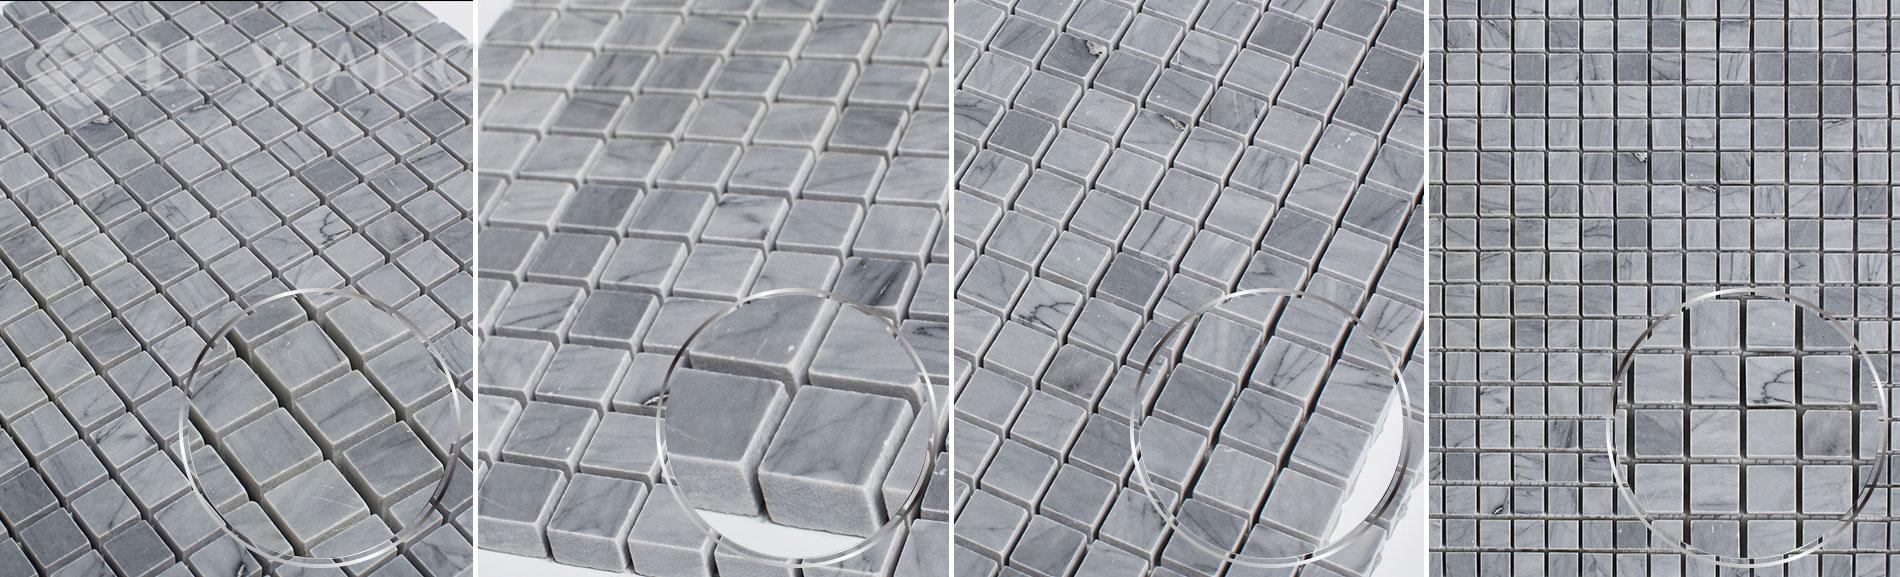 Square-Marble-Latin-Gray-Mosaic-Tile-Ktichen-Backsplash-5